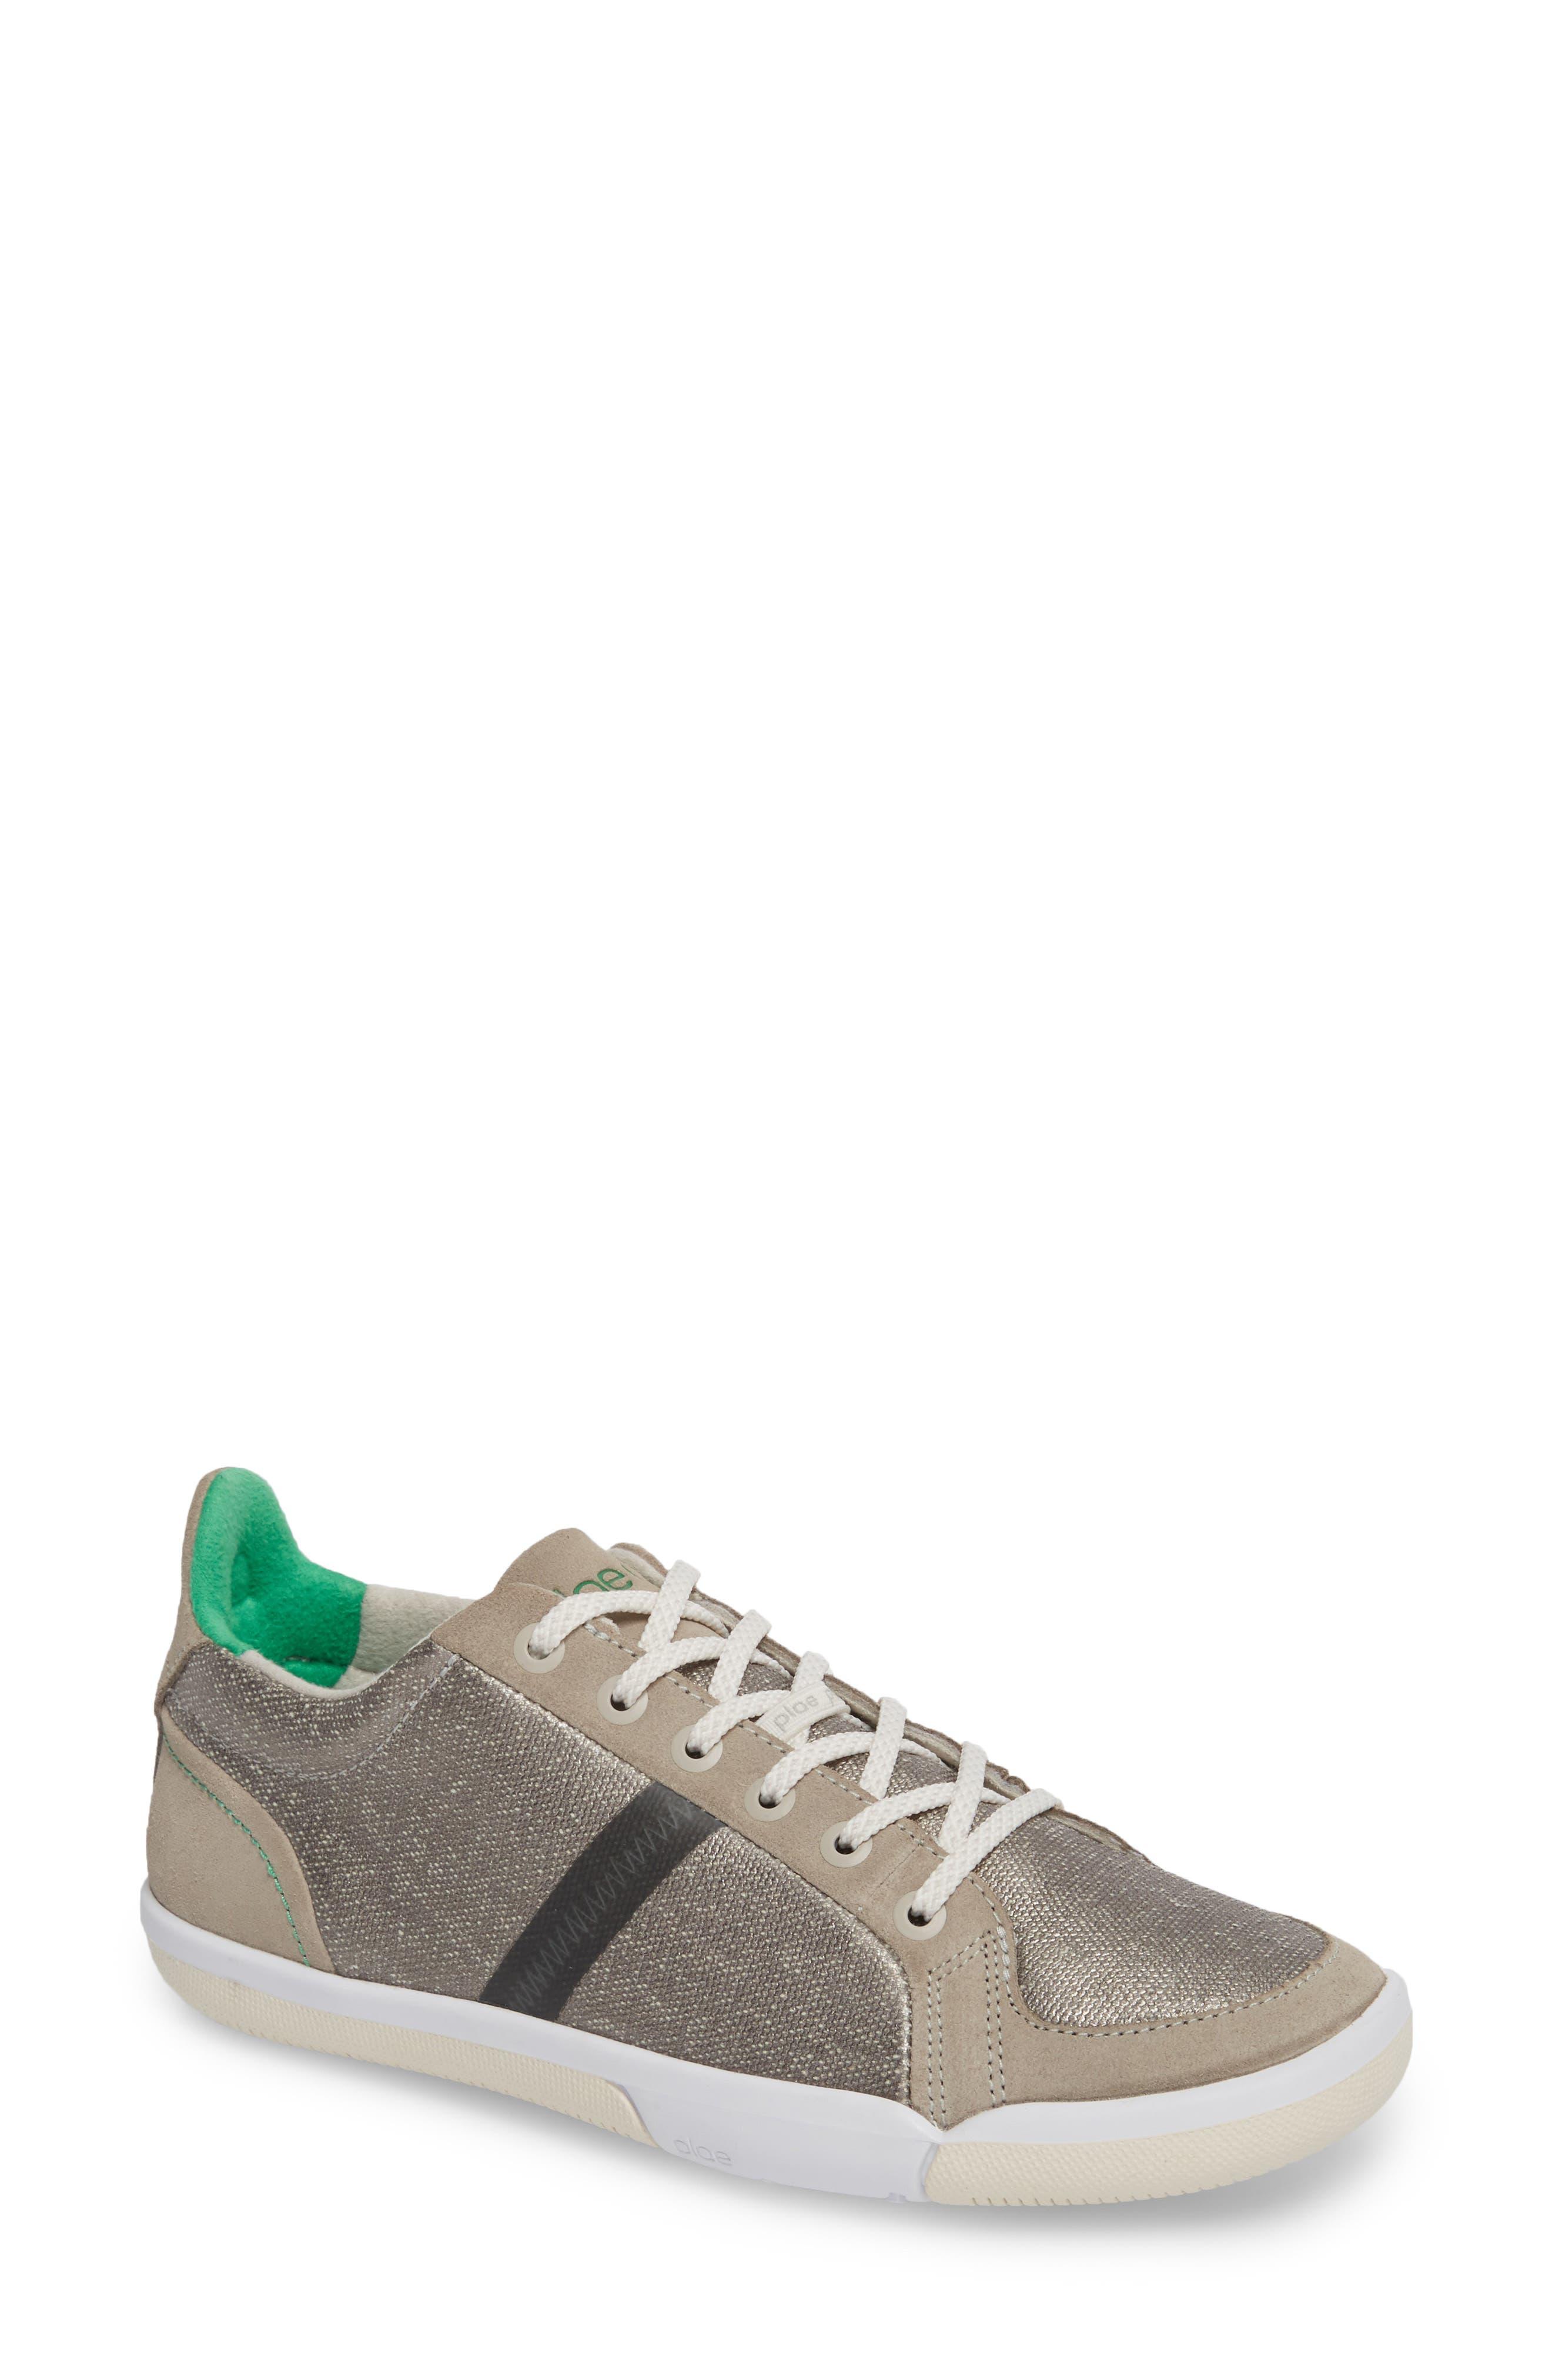 Prospect Sneaker,                             Main thumbnail 1, color,                             Grey